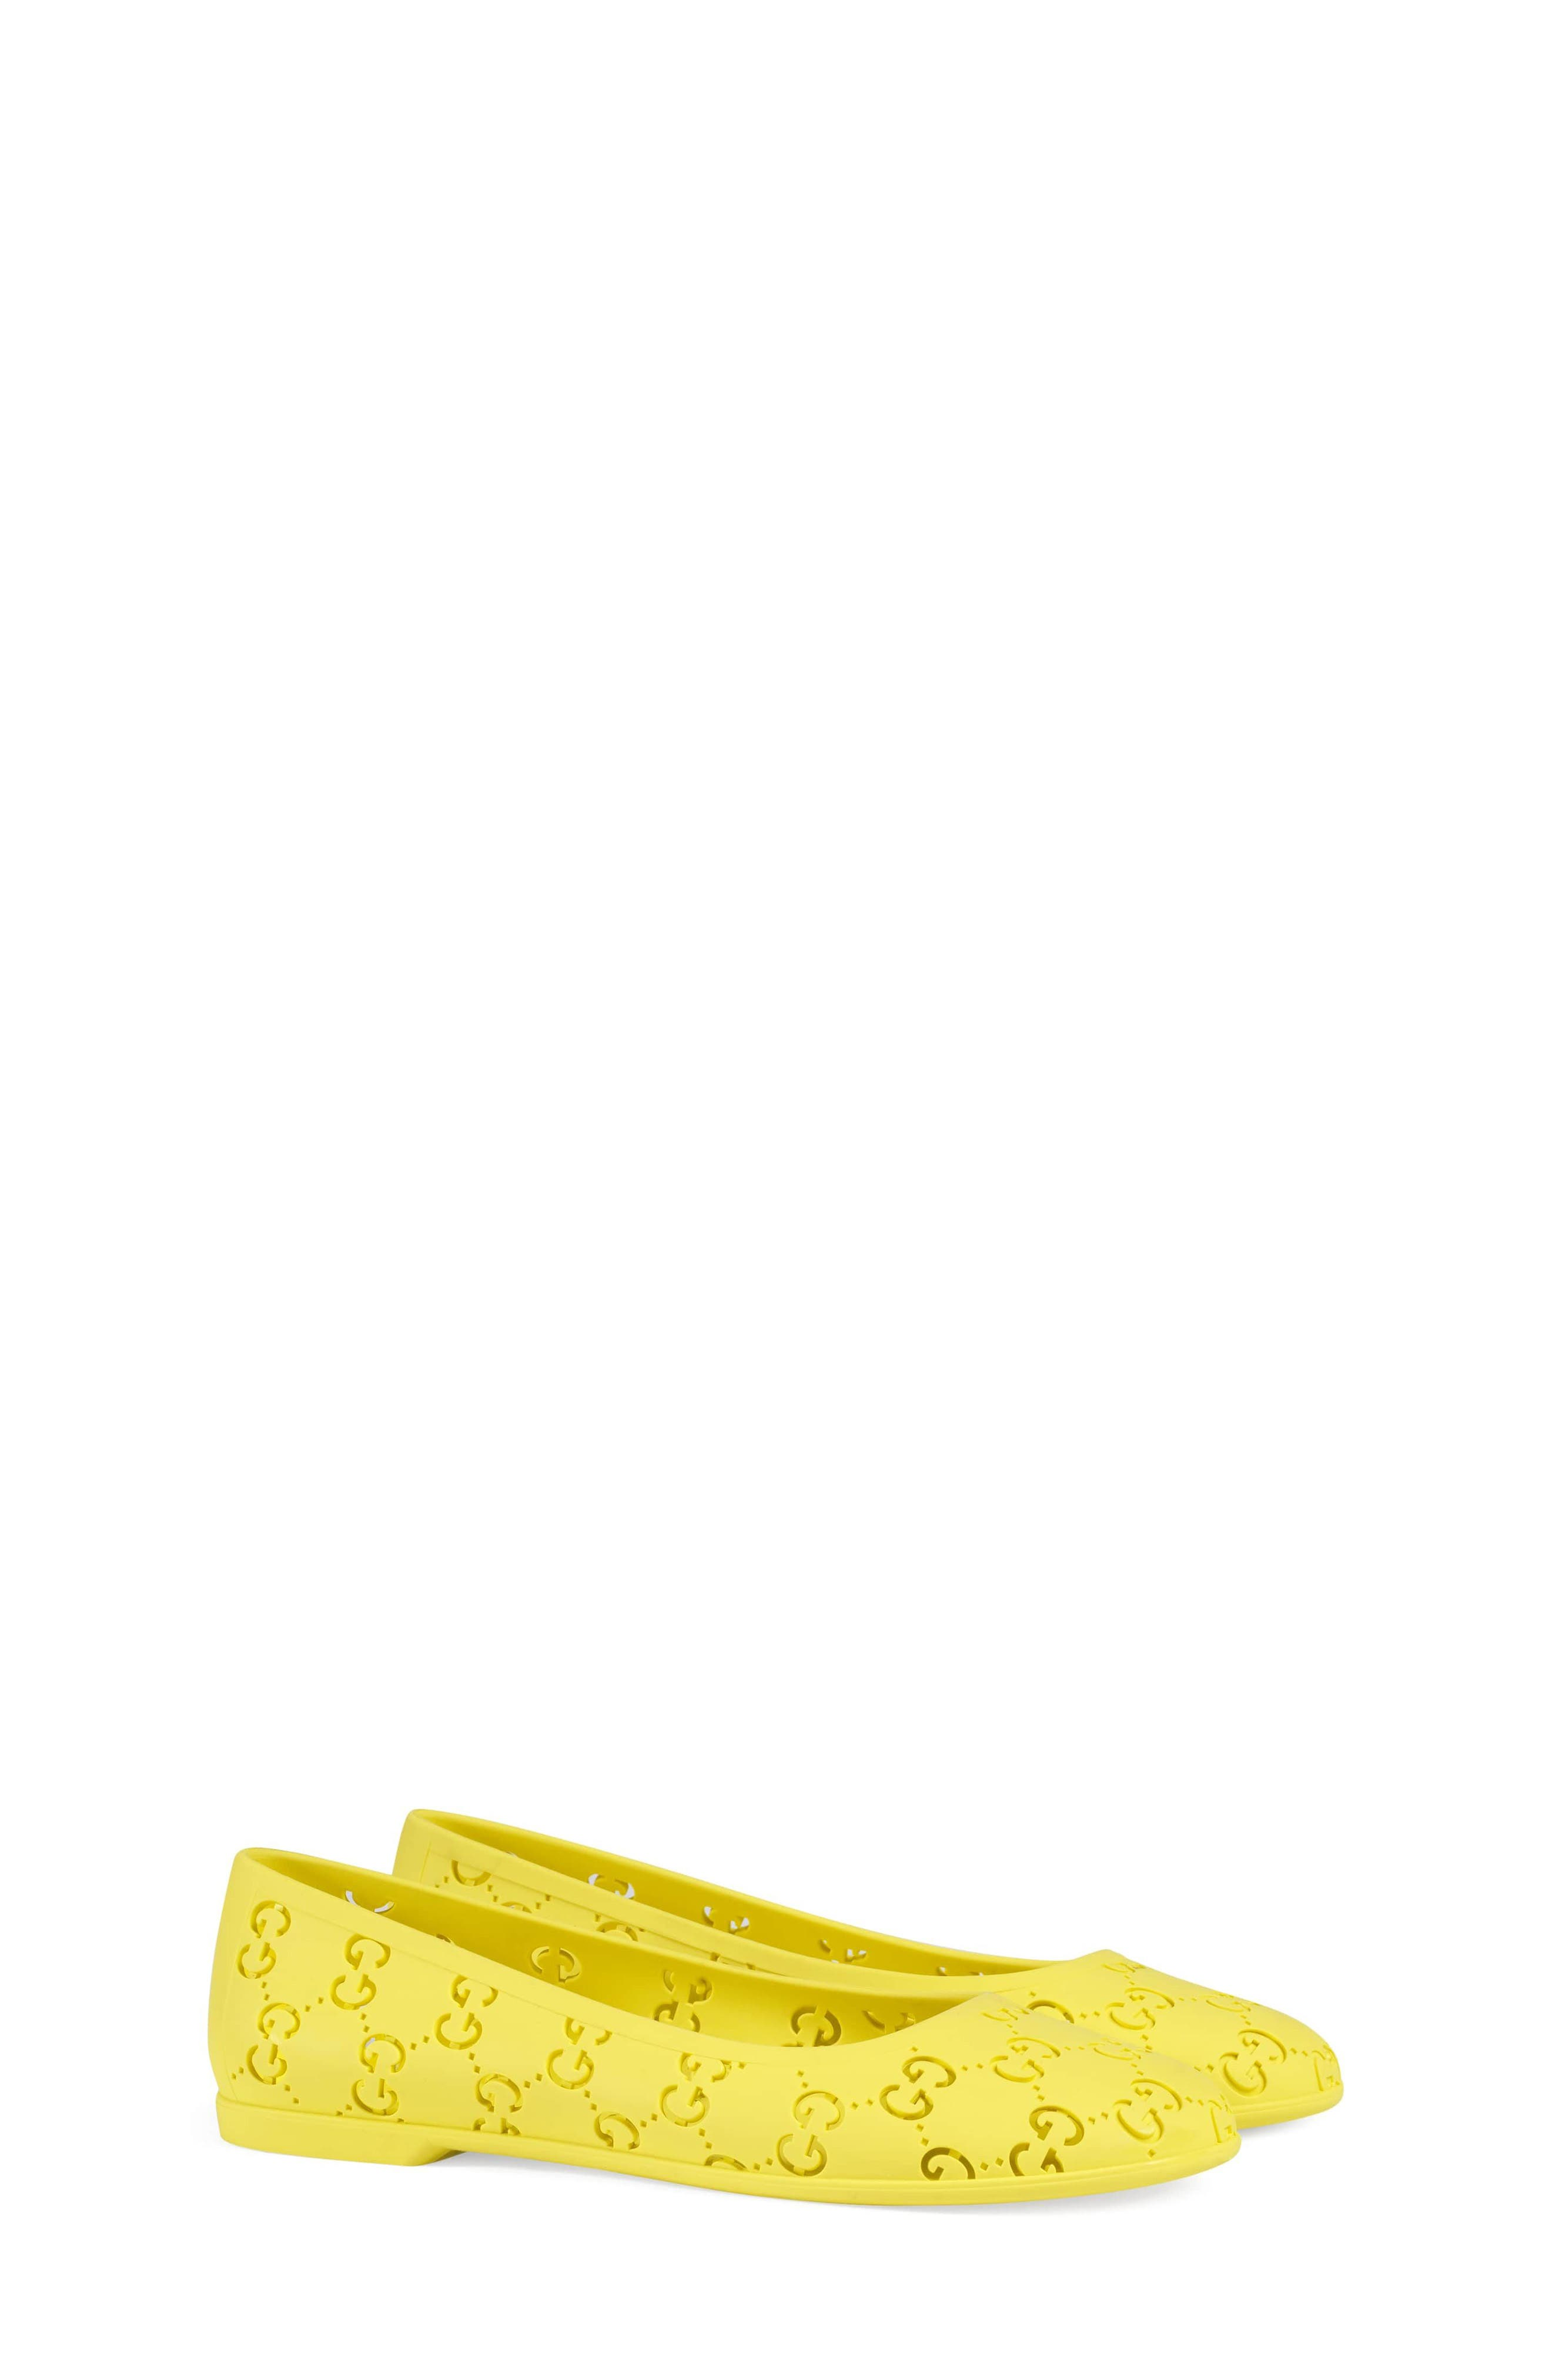 Junior Etretat Flat,                             Main thumbnail 1, color,                             ACID YELLOW